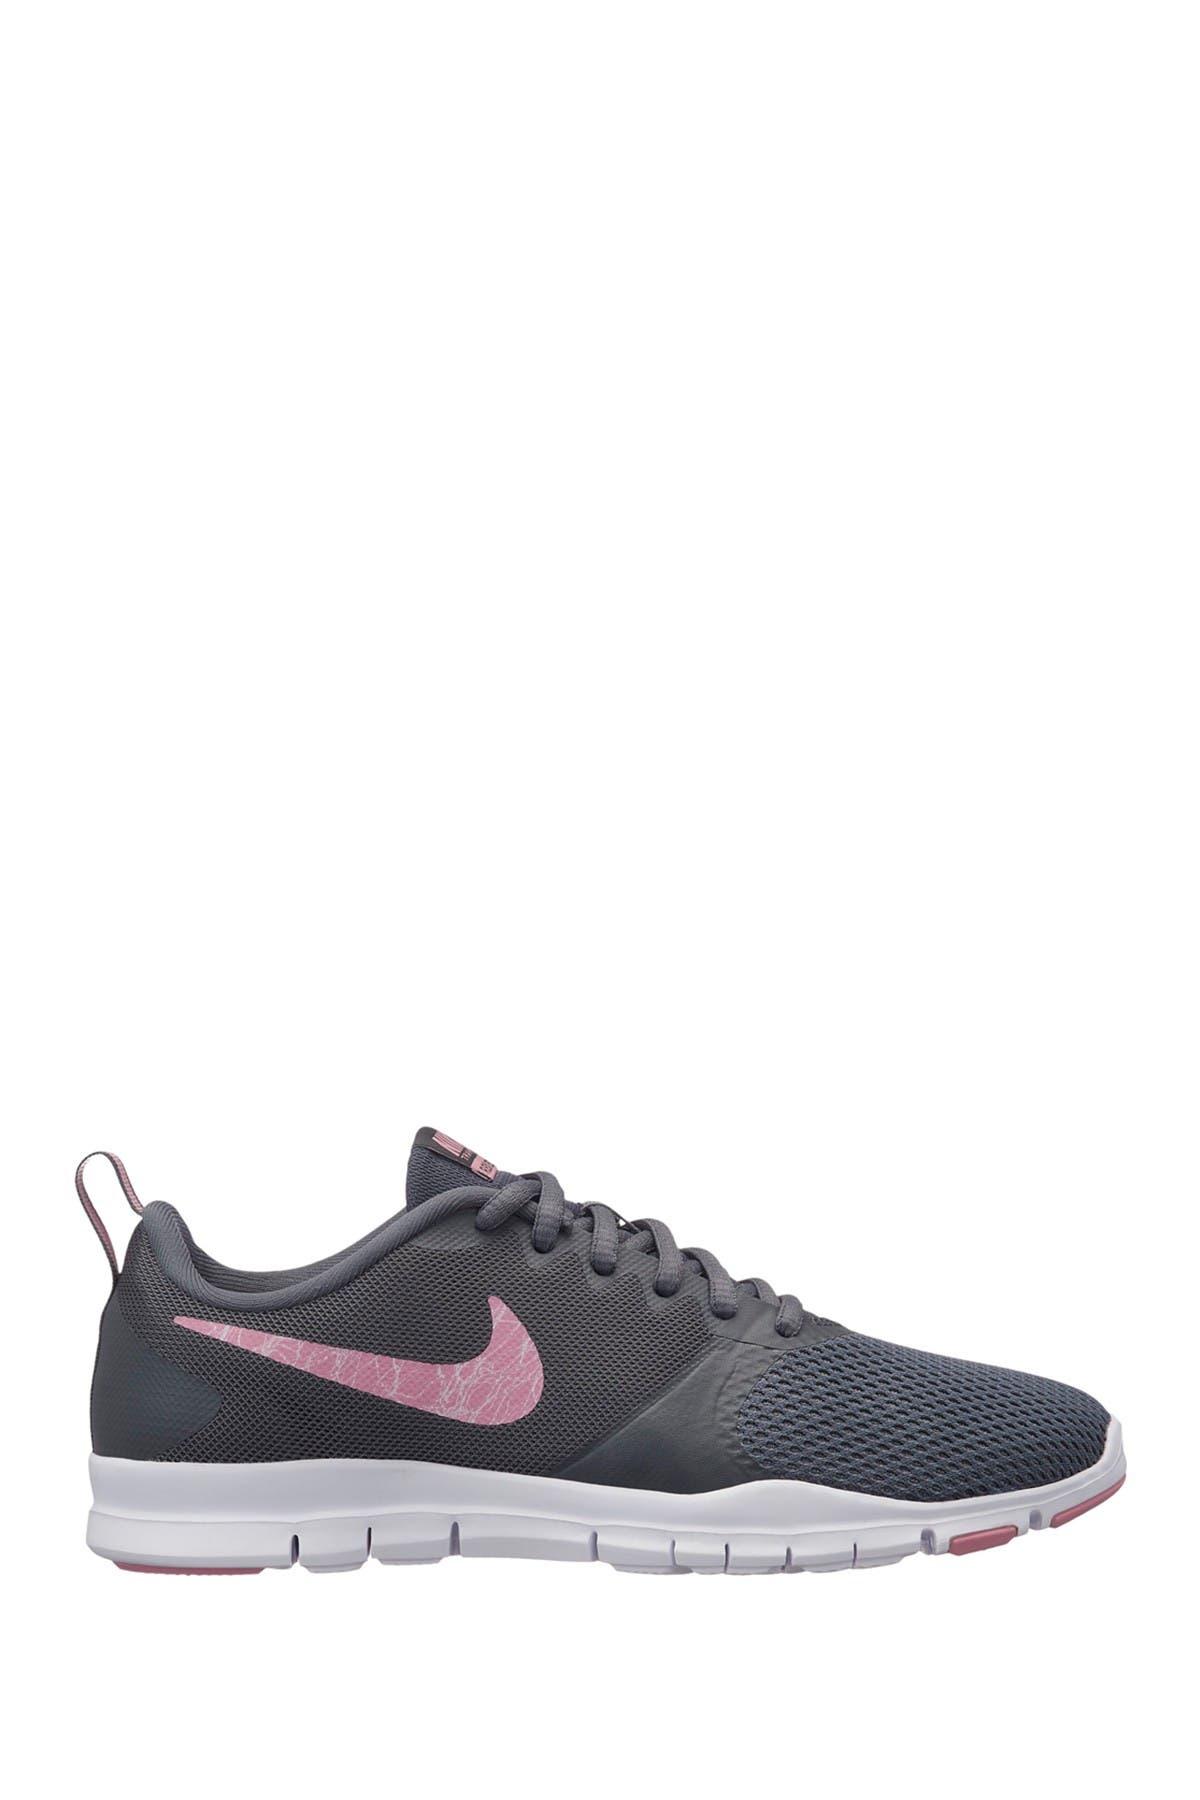 Nike   Flex Essential TR Trainer